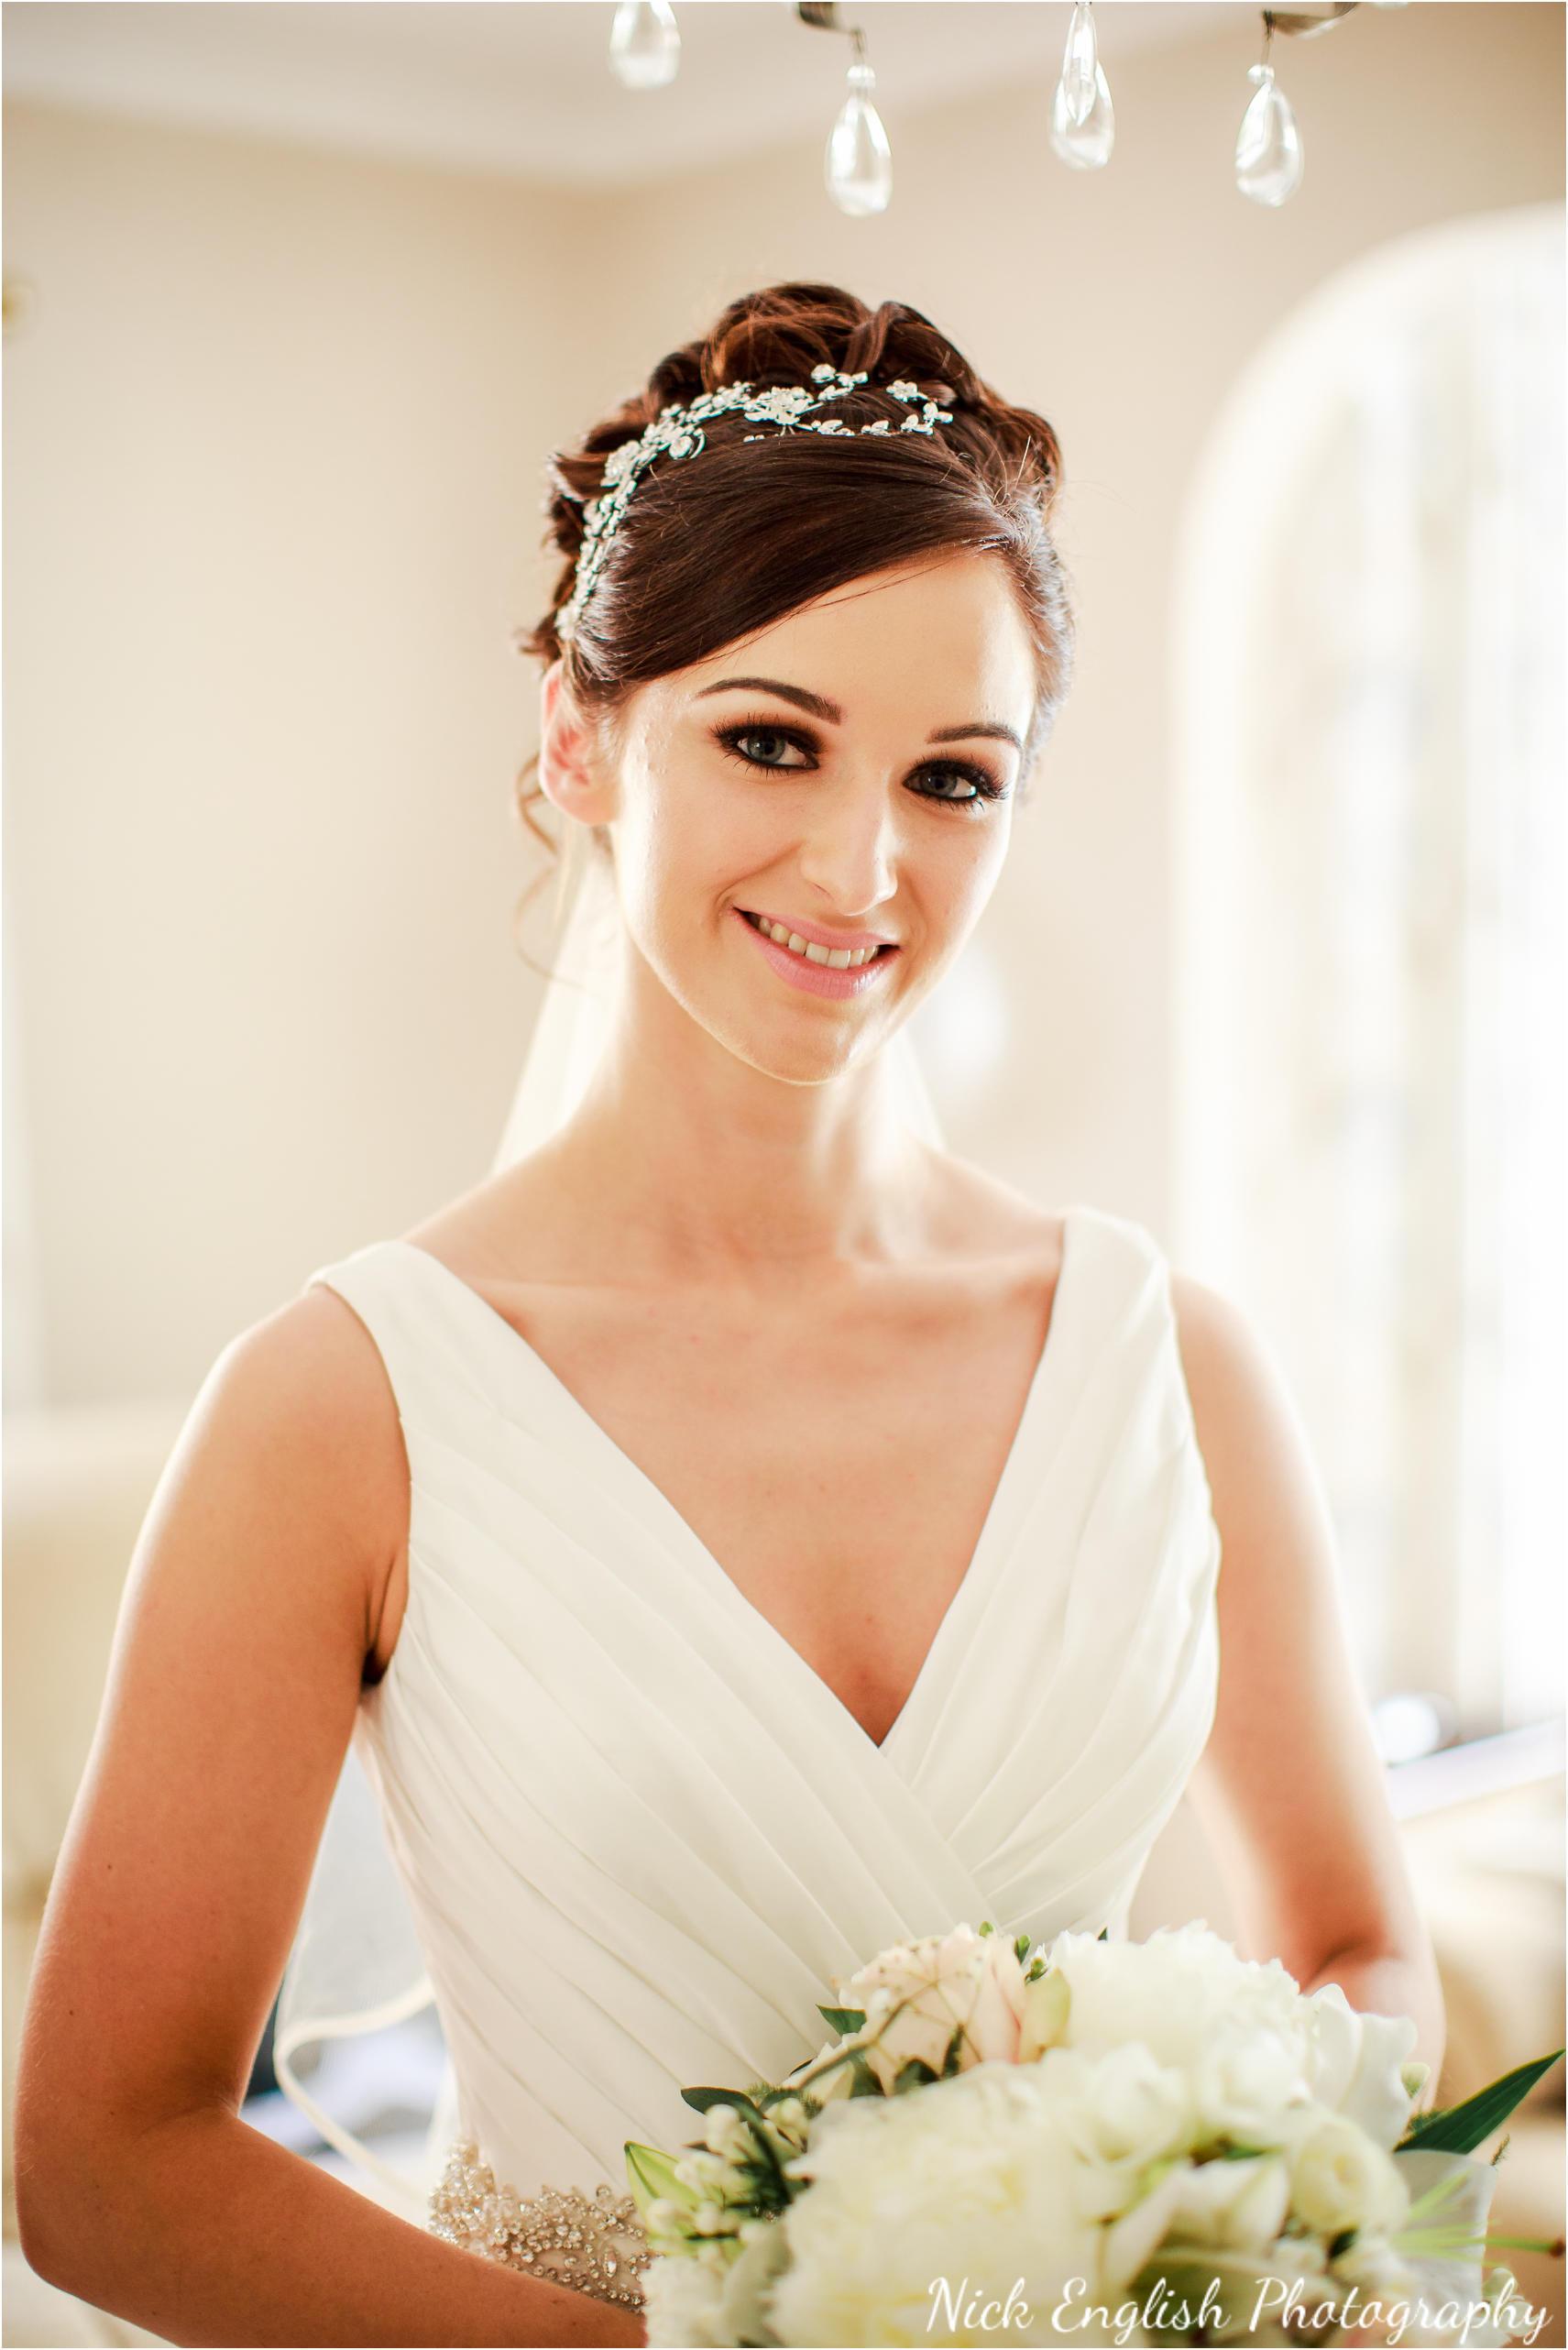 Emily David Wedding Photographs at Barton Grange Preston by Nick English Photography 34jpg.jpeg